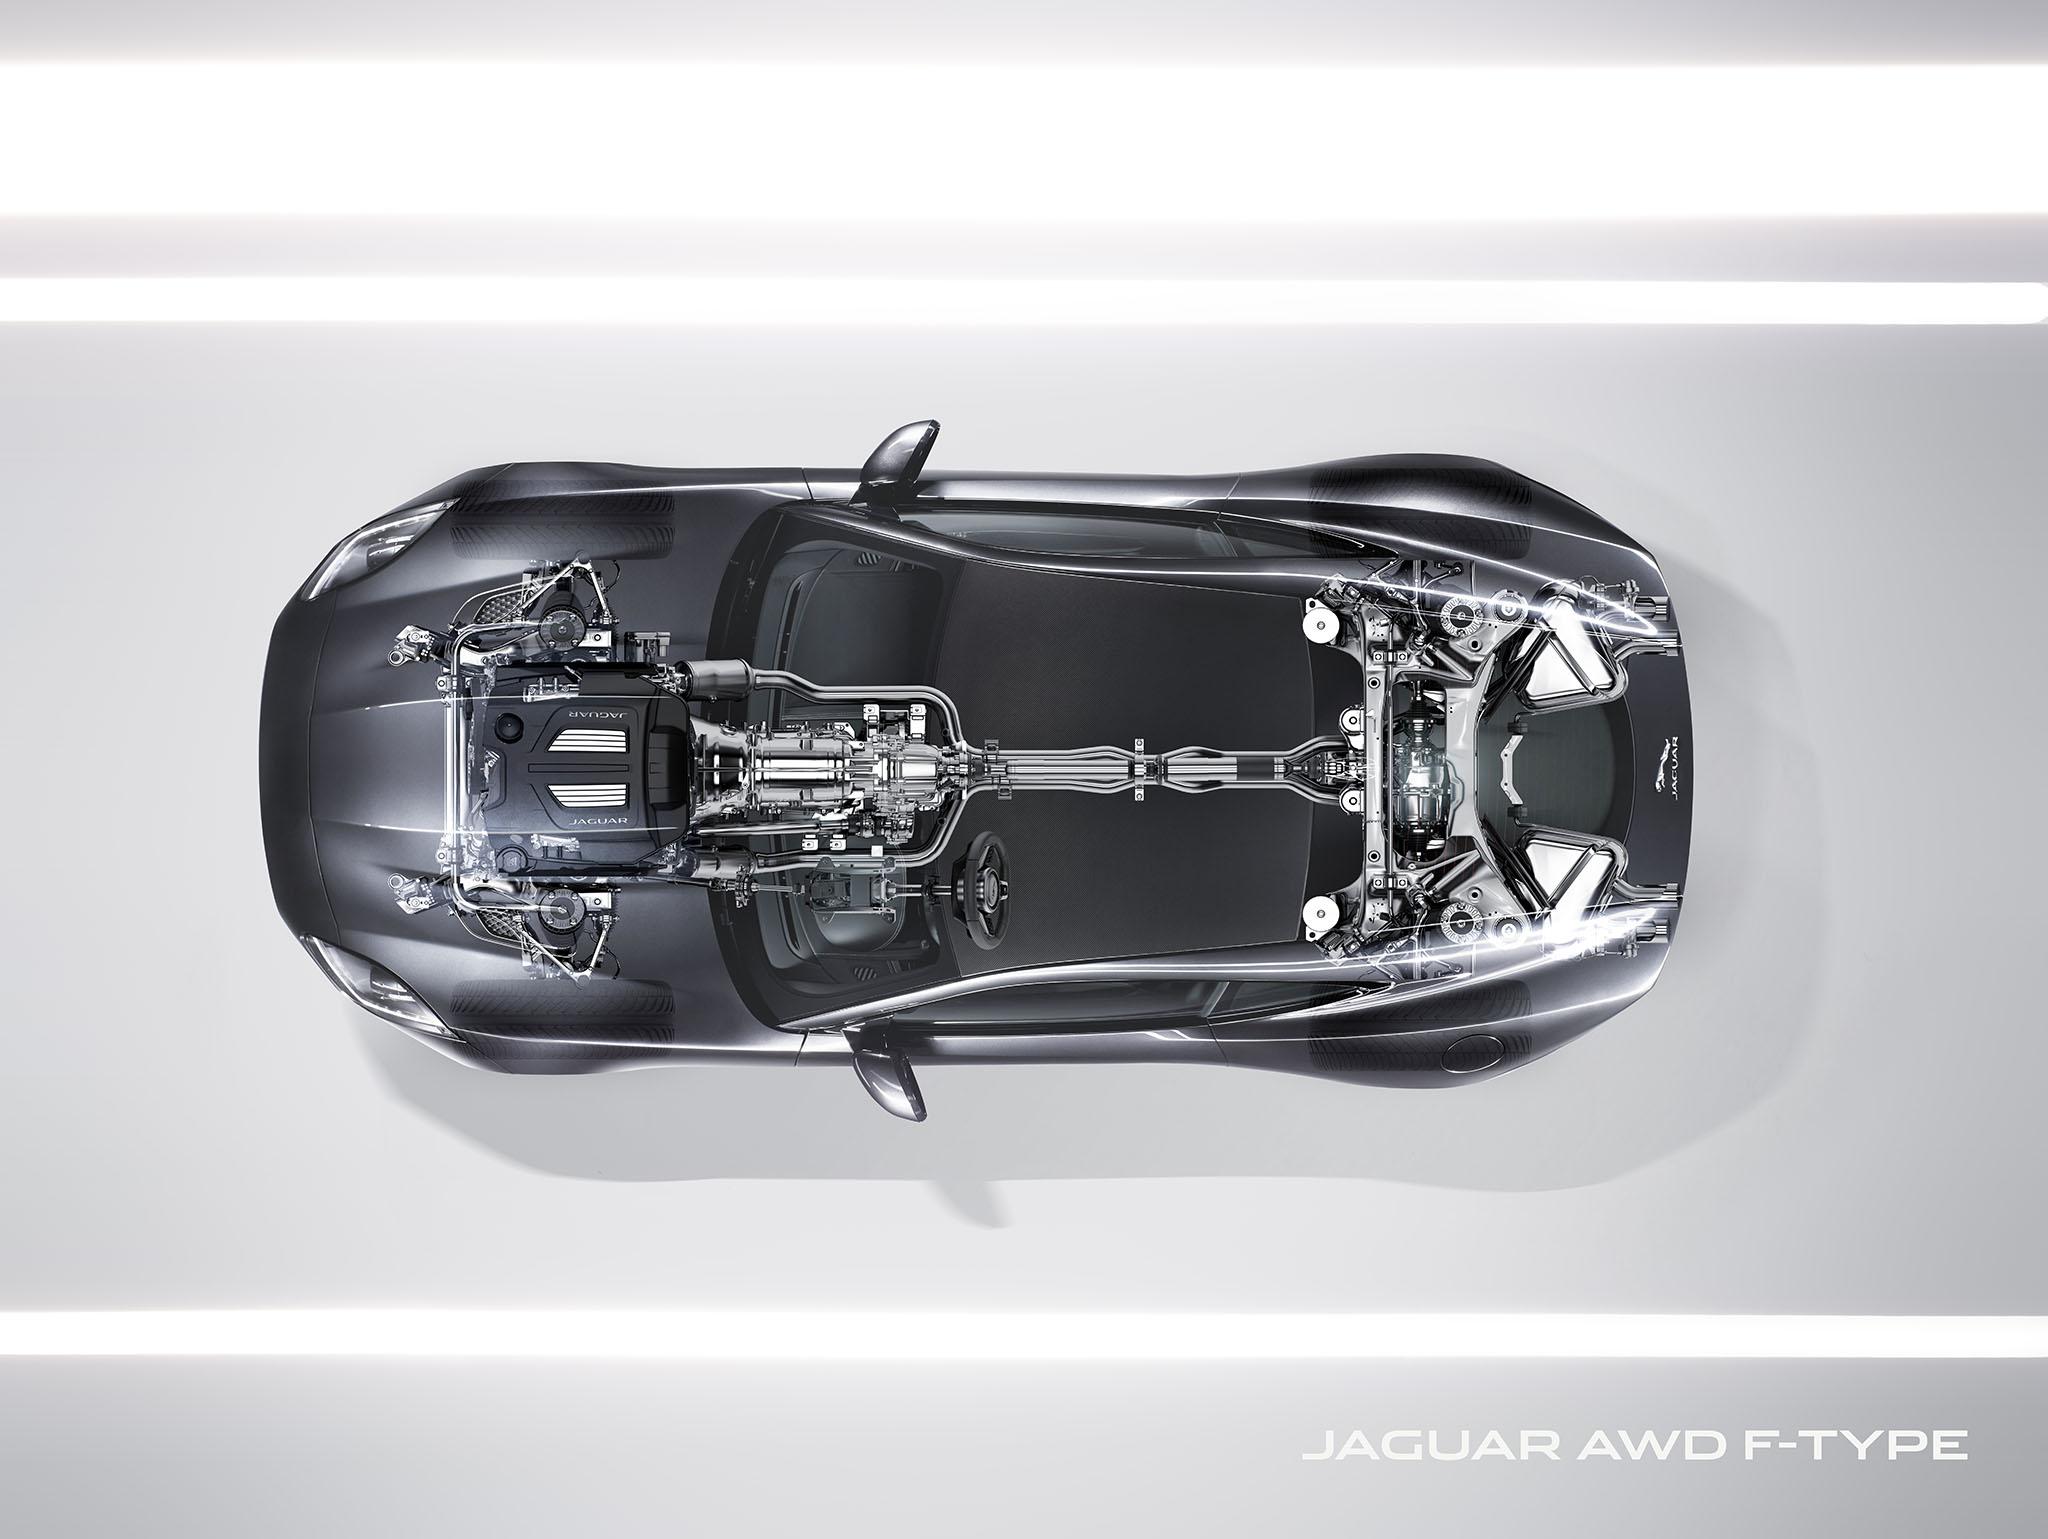 JaguarFTypeAWD 02